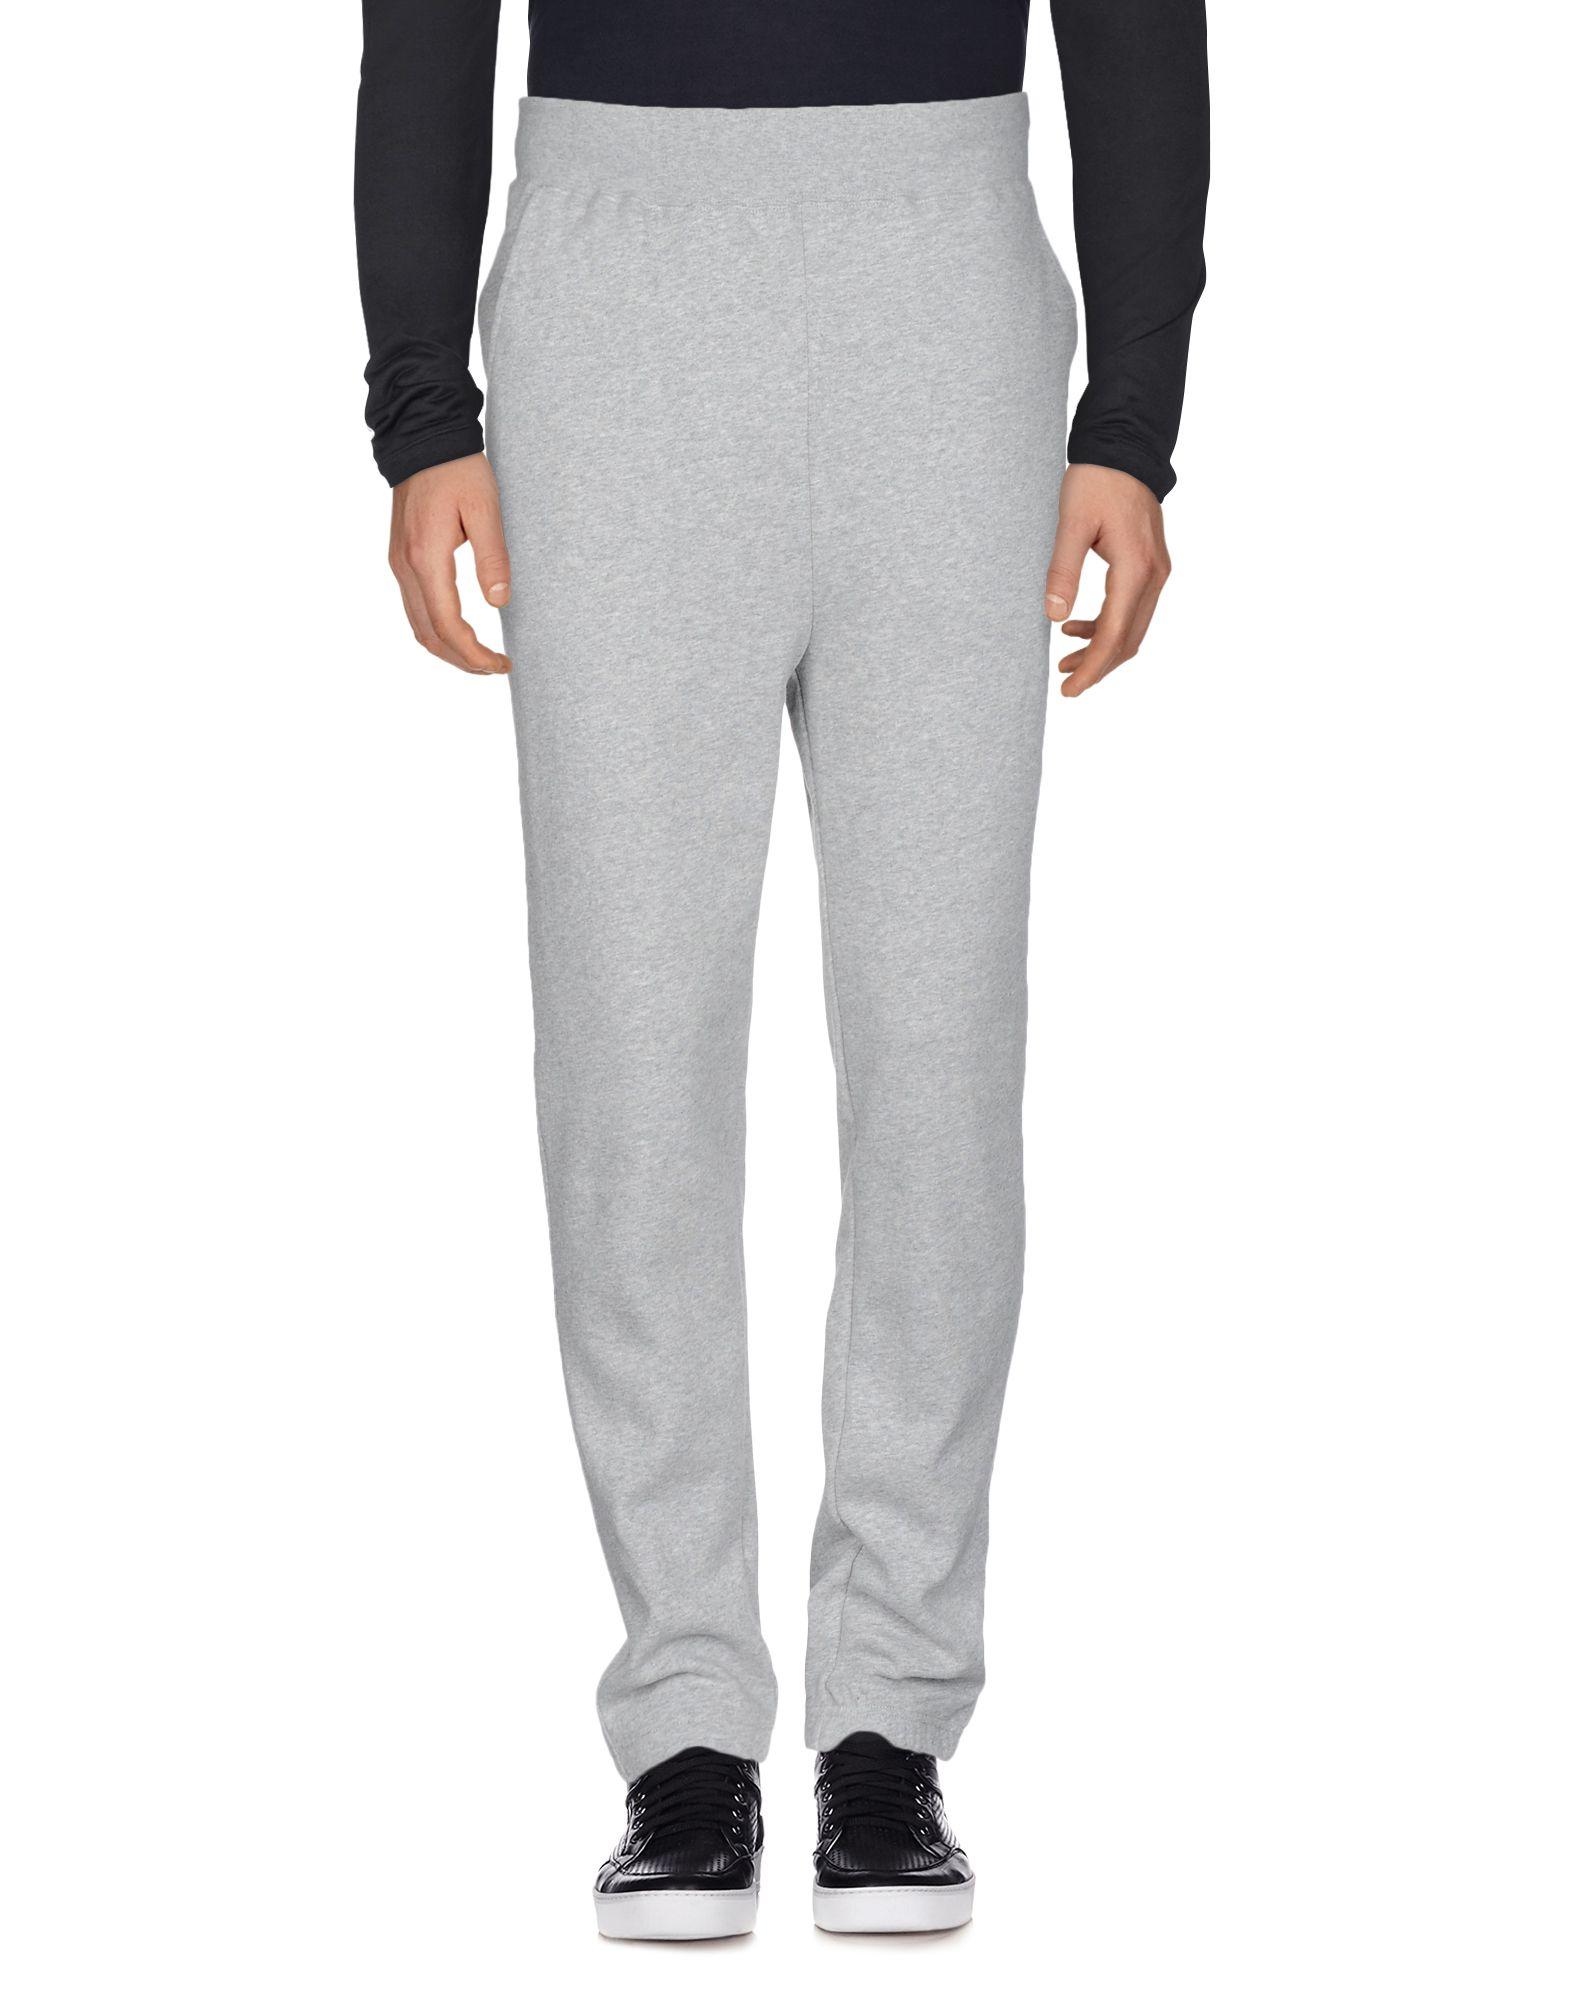 POLER Casual Pants in Grey